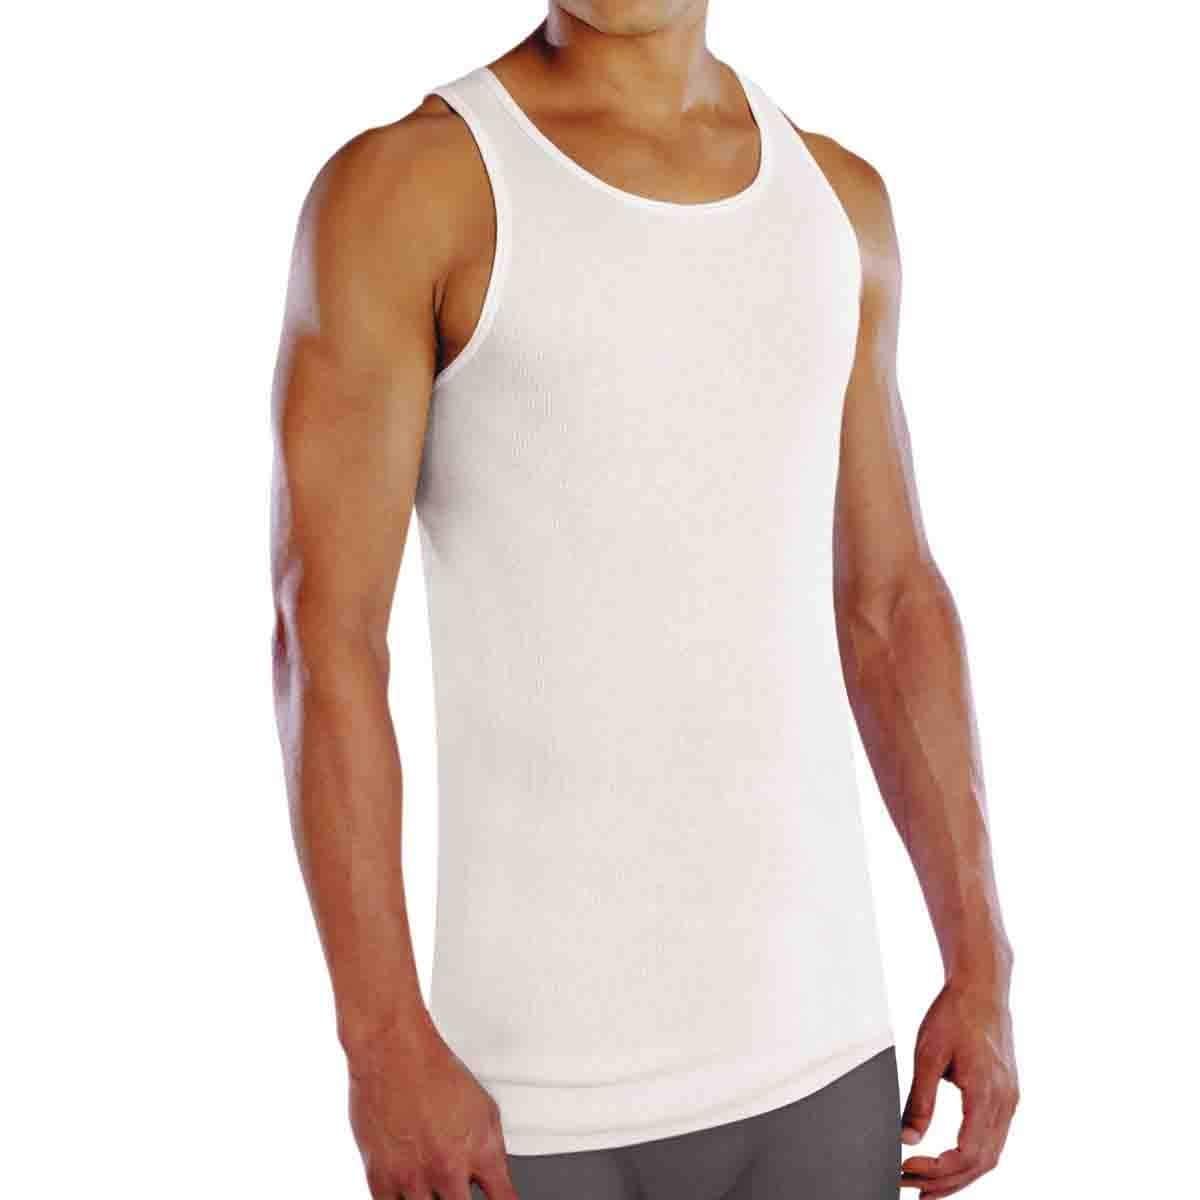 Camiseta Atlética de Algodón Premium Ultra Suave Blanco para Hombre. Paquete de 3 Fruit Of The Loom